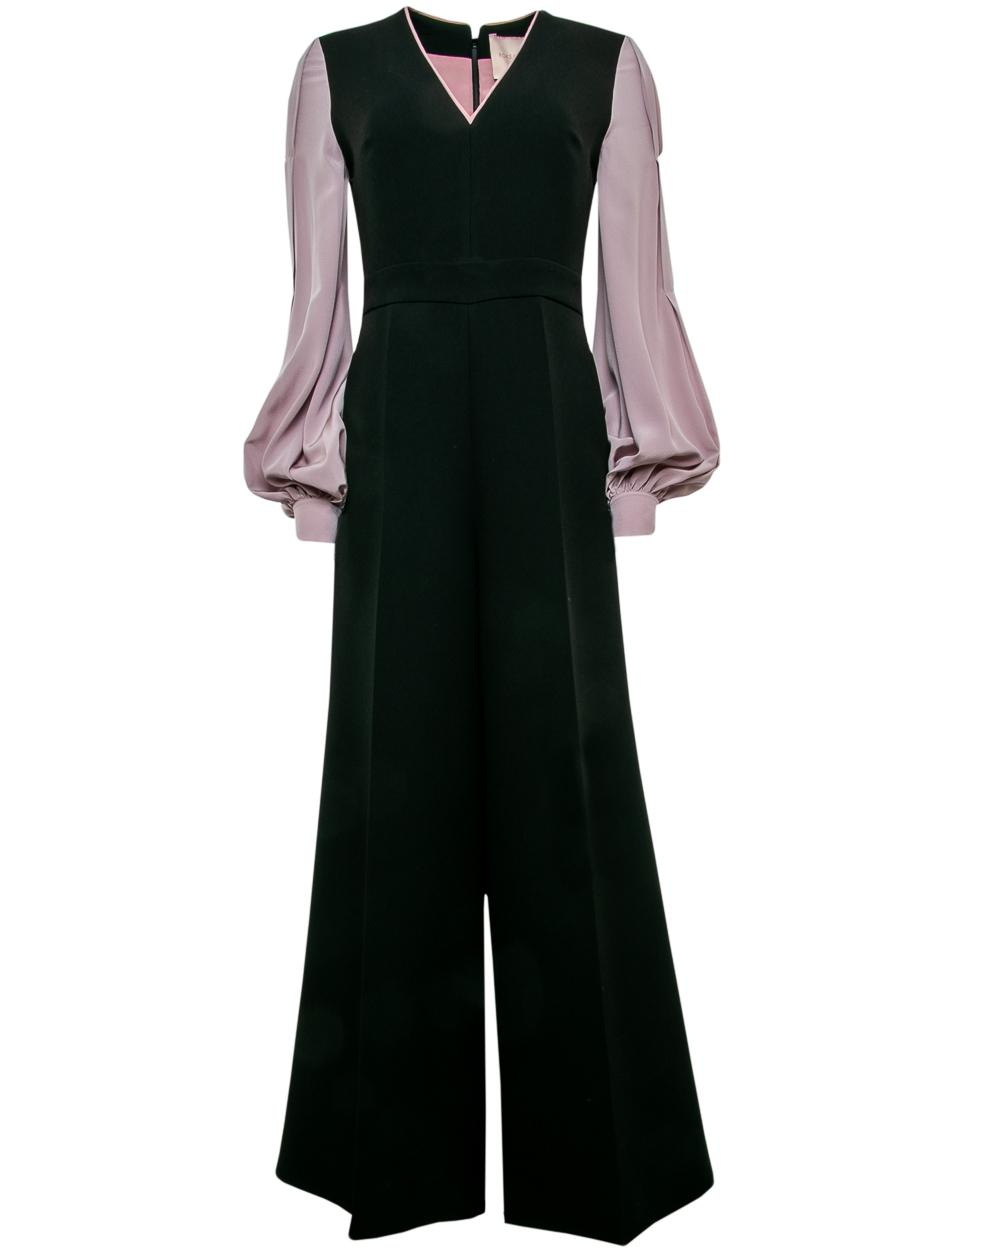 7a847384bc9 Lyst - ROKSANDA Crepe De Chine Tonia Jumpsuit in Black